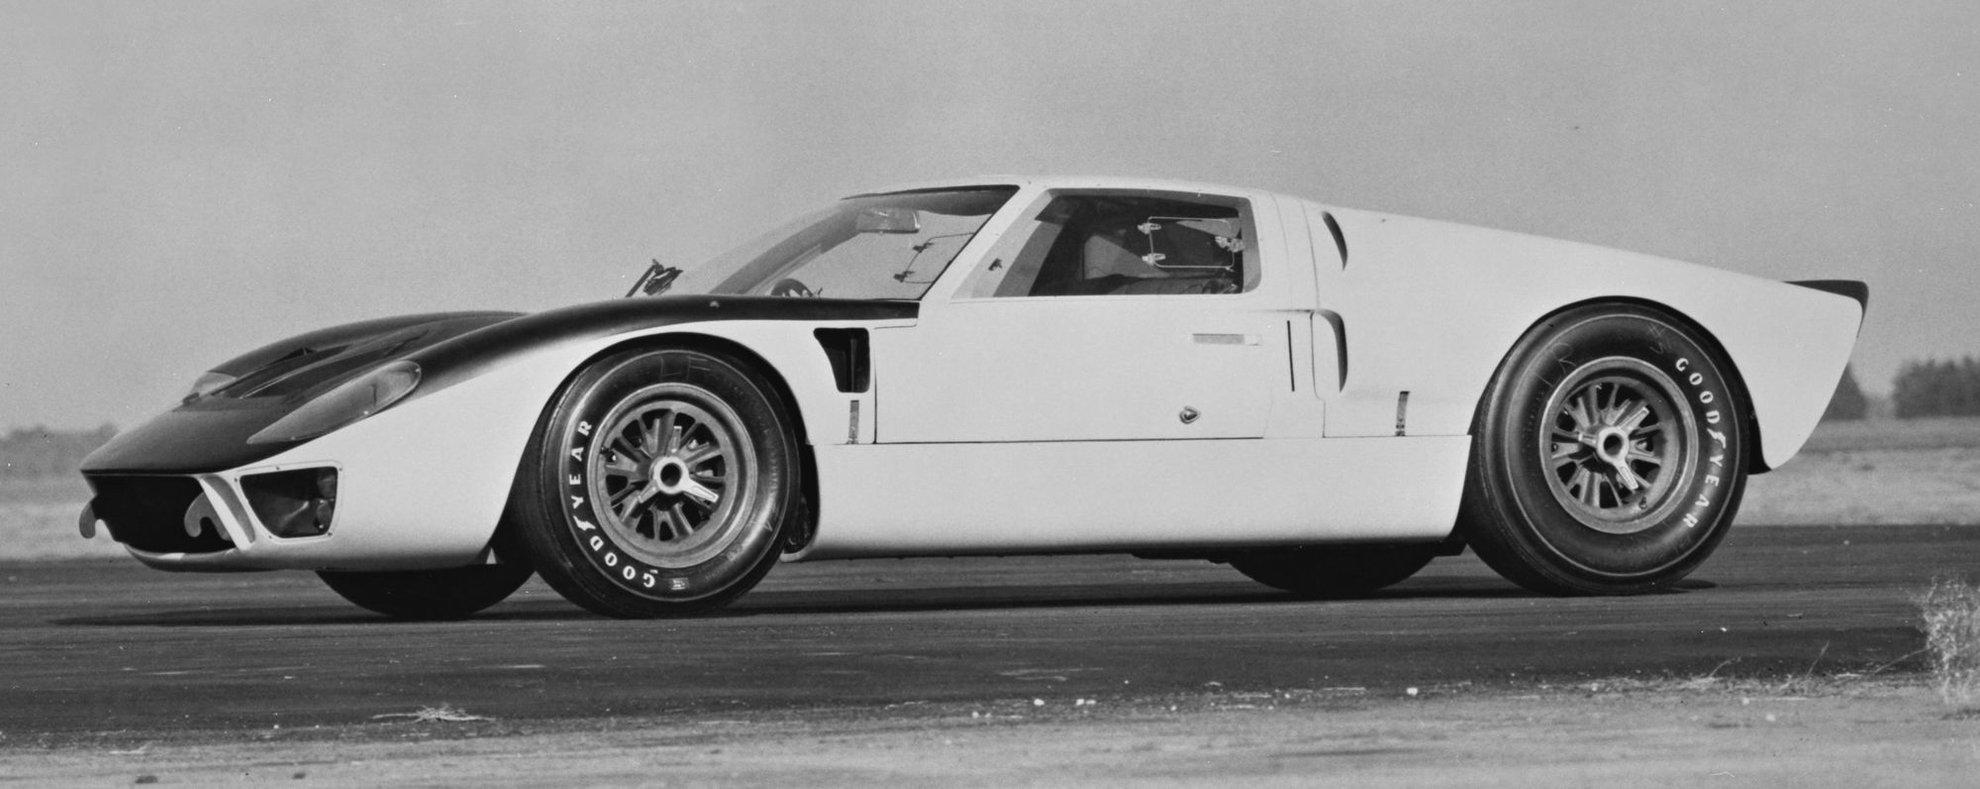 1966-Ford-GT-MkII-FIA-Sebring-testing-neg-146840-029.jpg